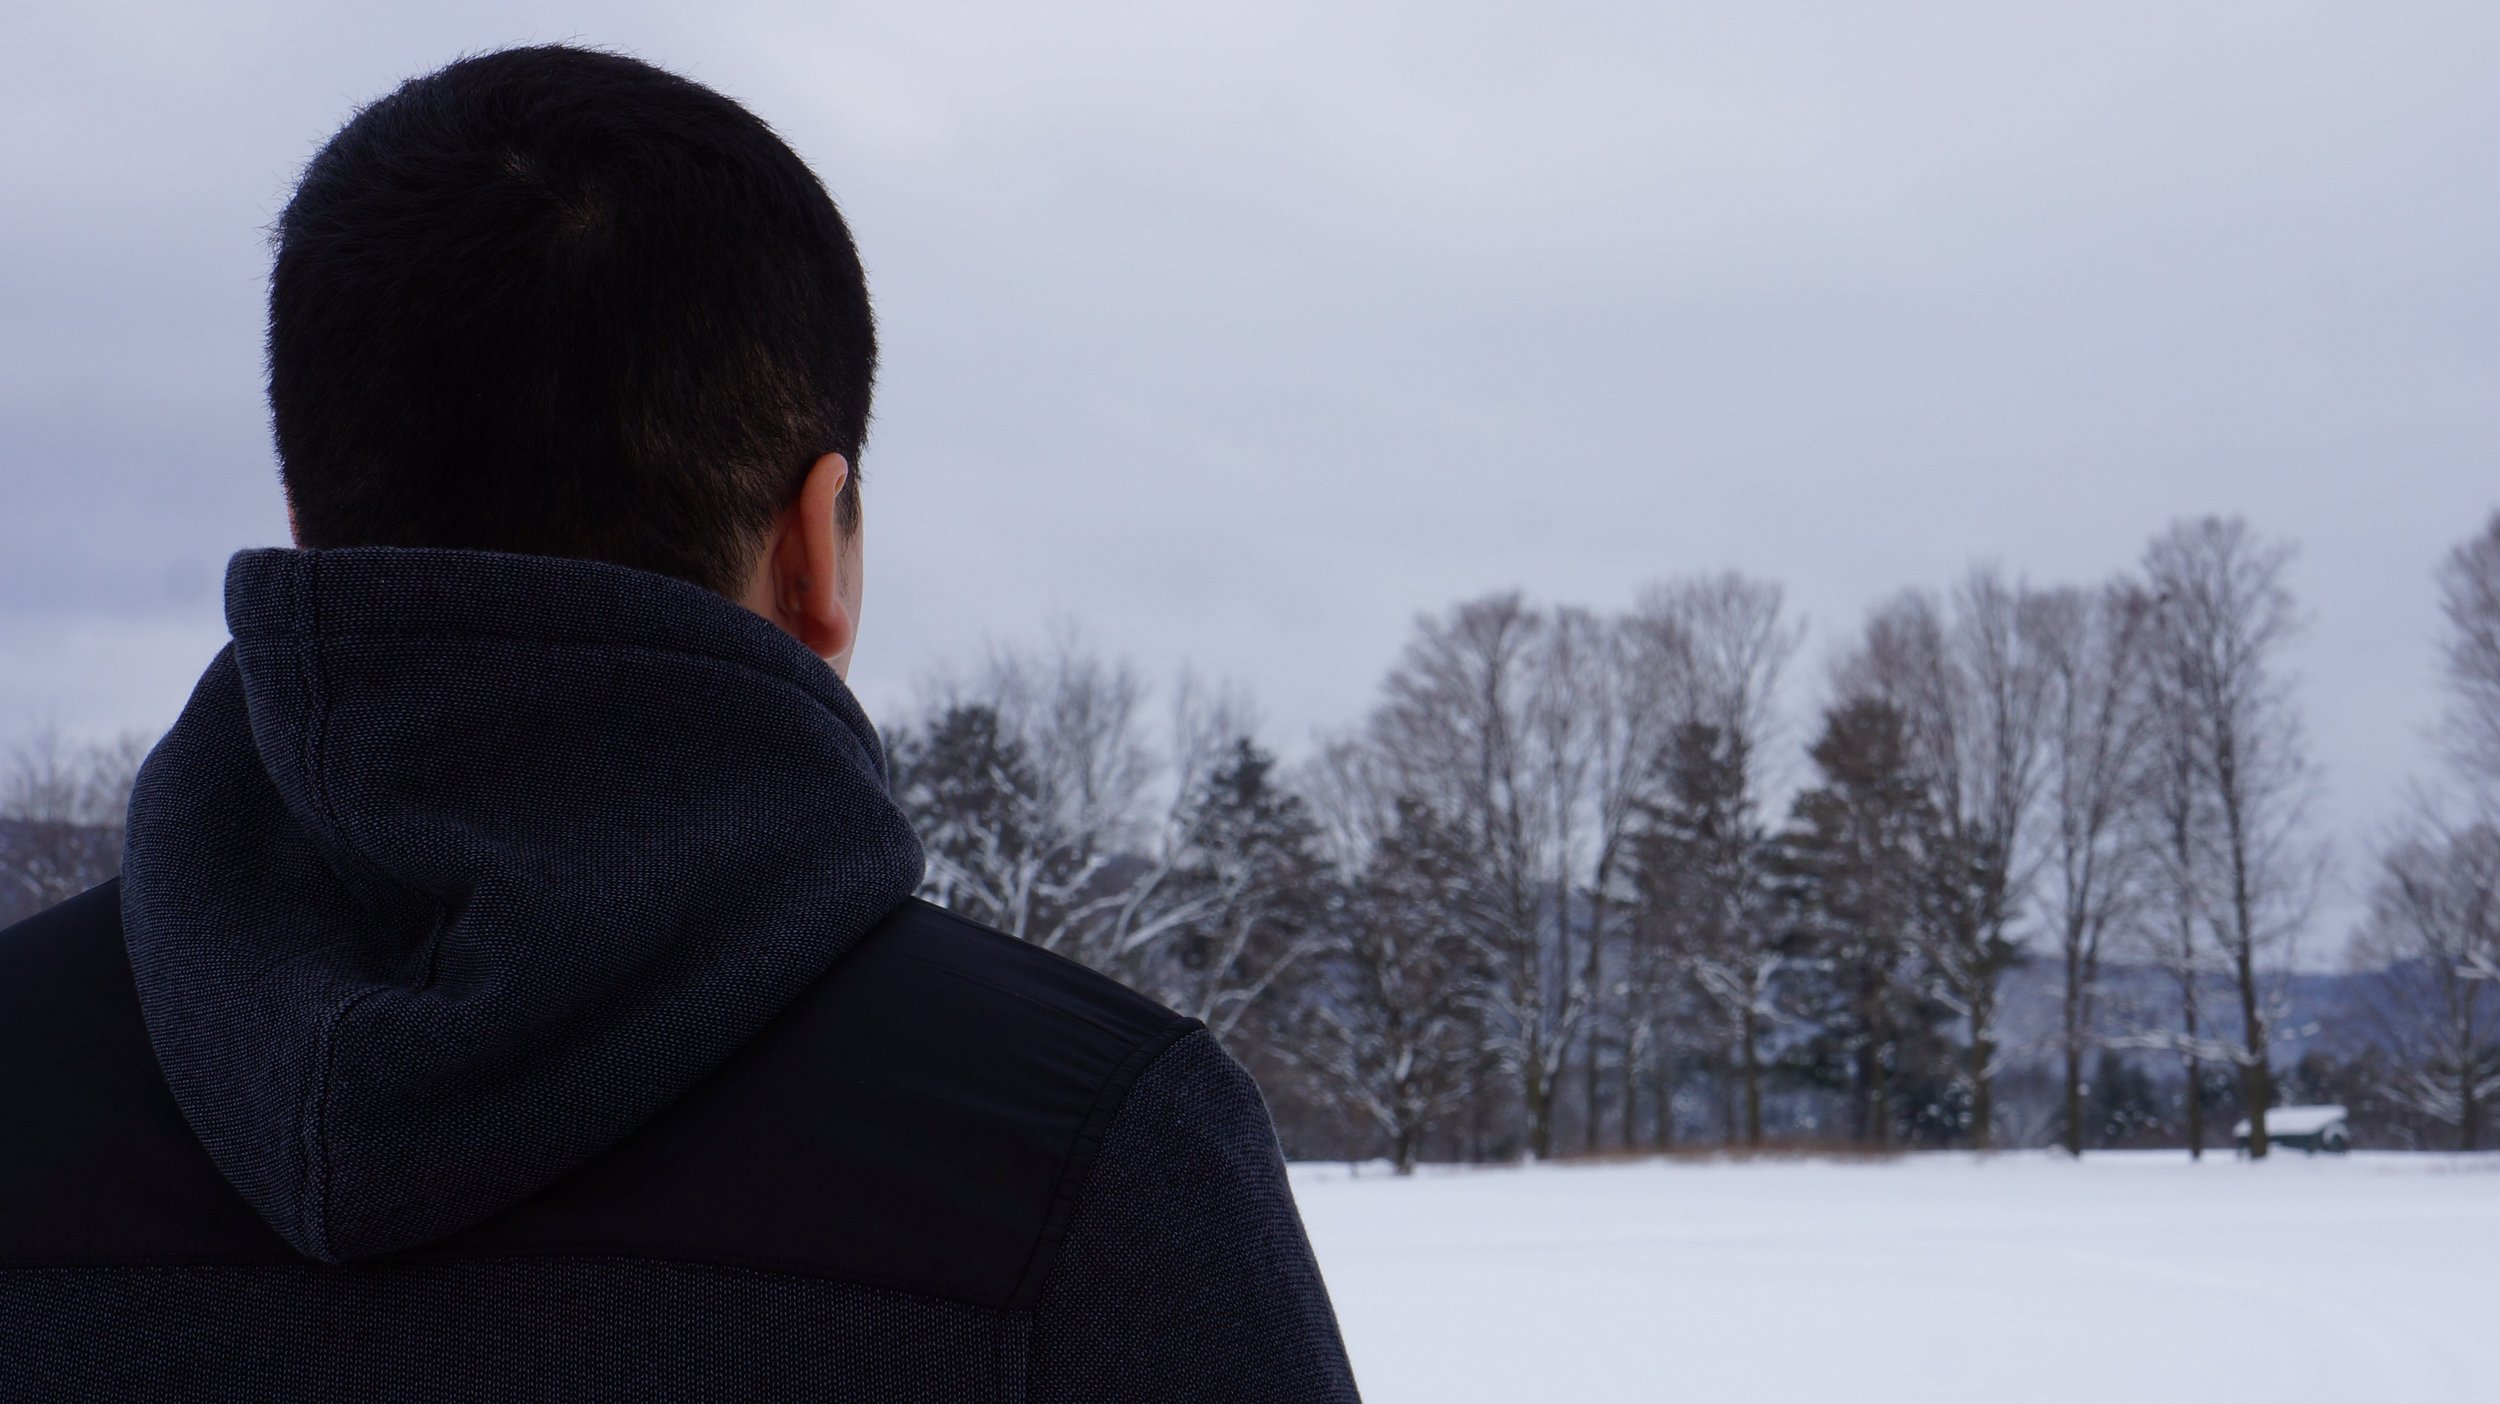 An undocumented farm worker in New England, USA. Photo by Erica Heilman.